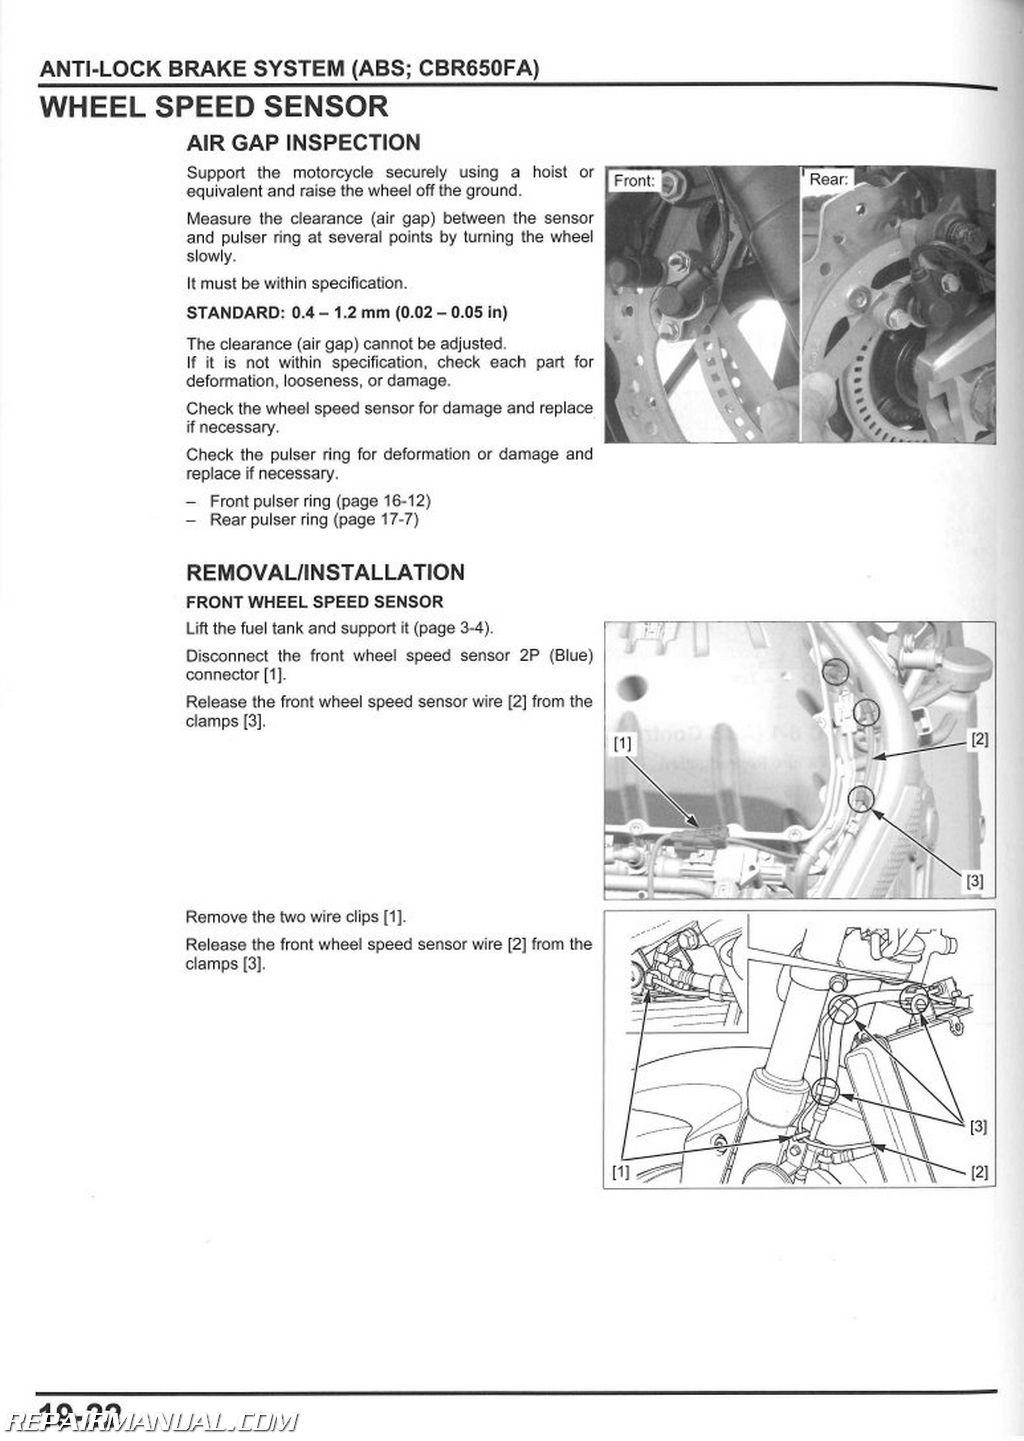 2013  U2013 2015 Honda Nch50 Metropolitan Scooter Service Manual   61ggl02